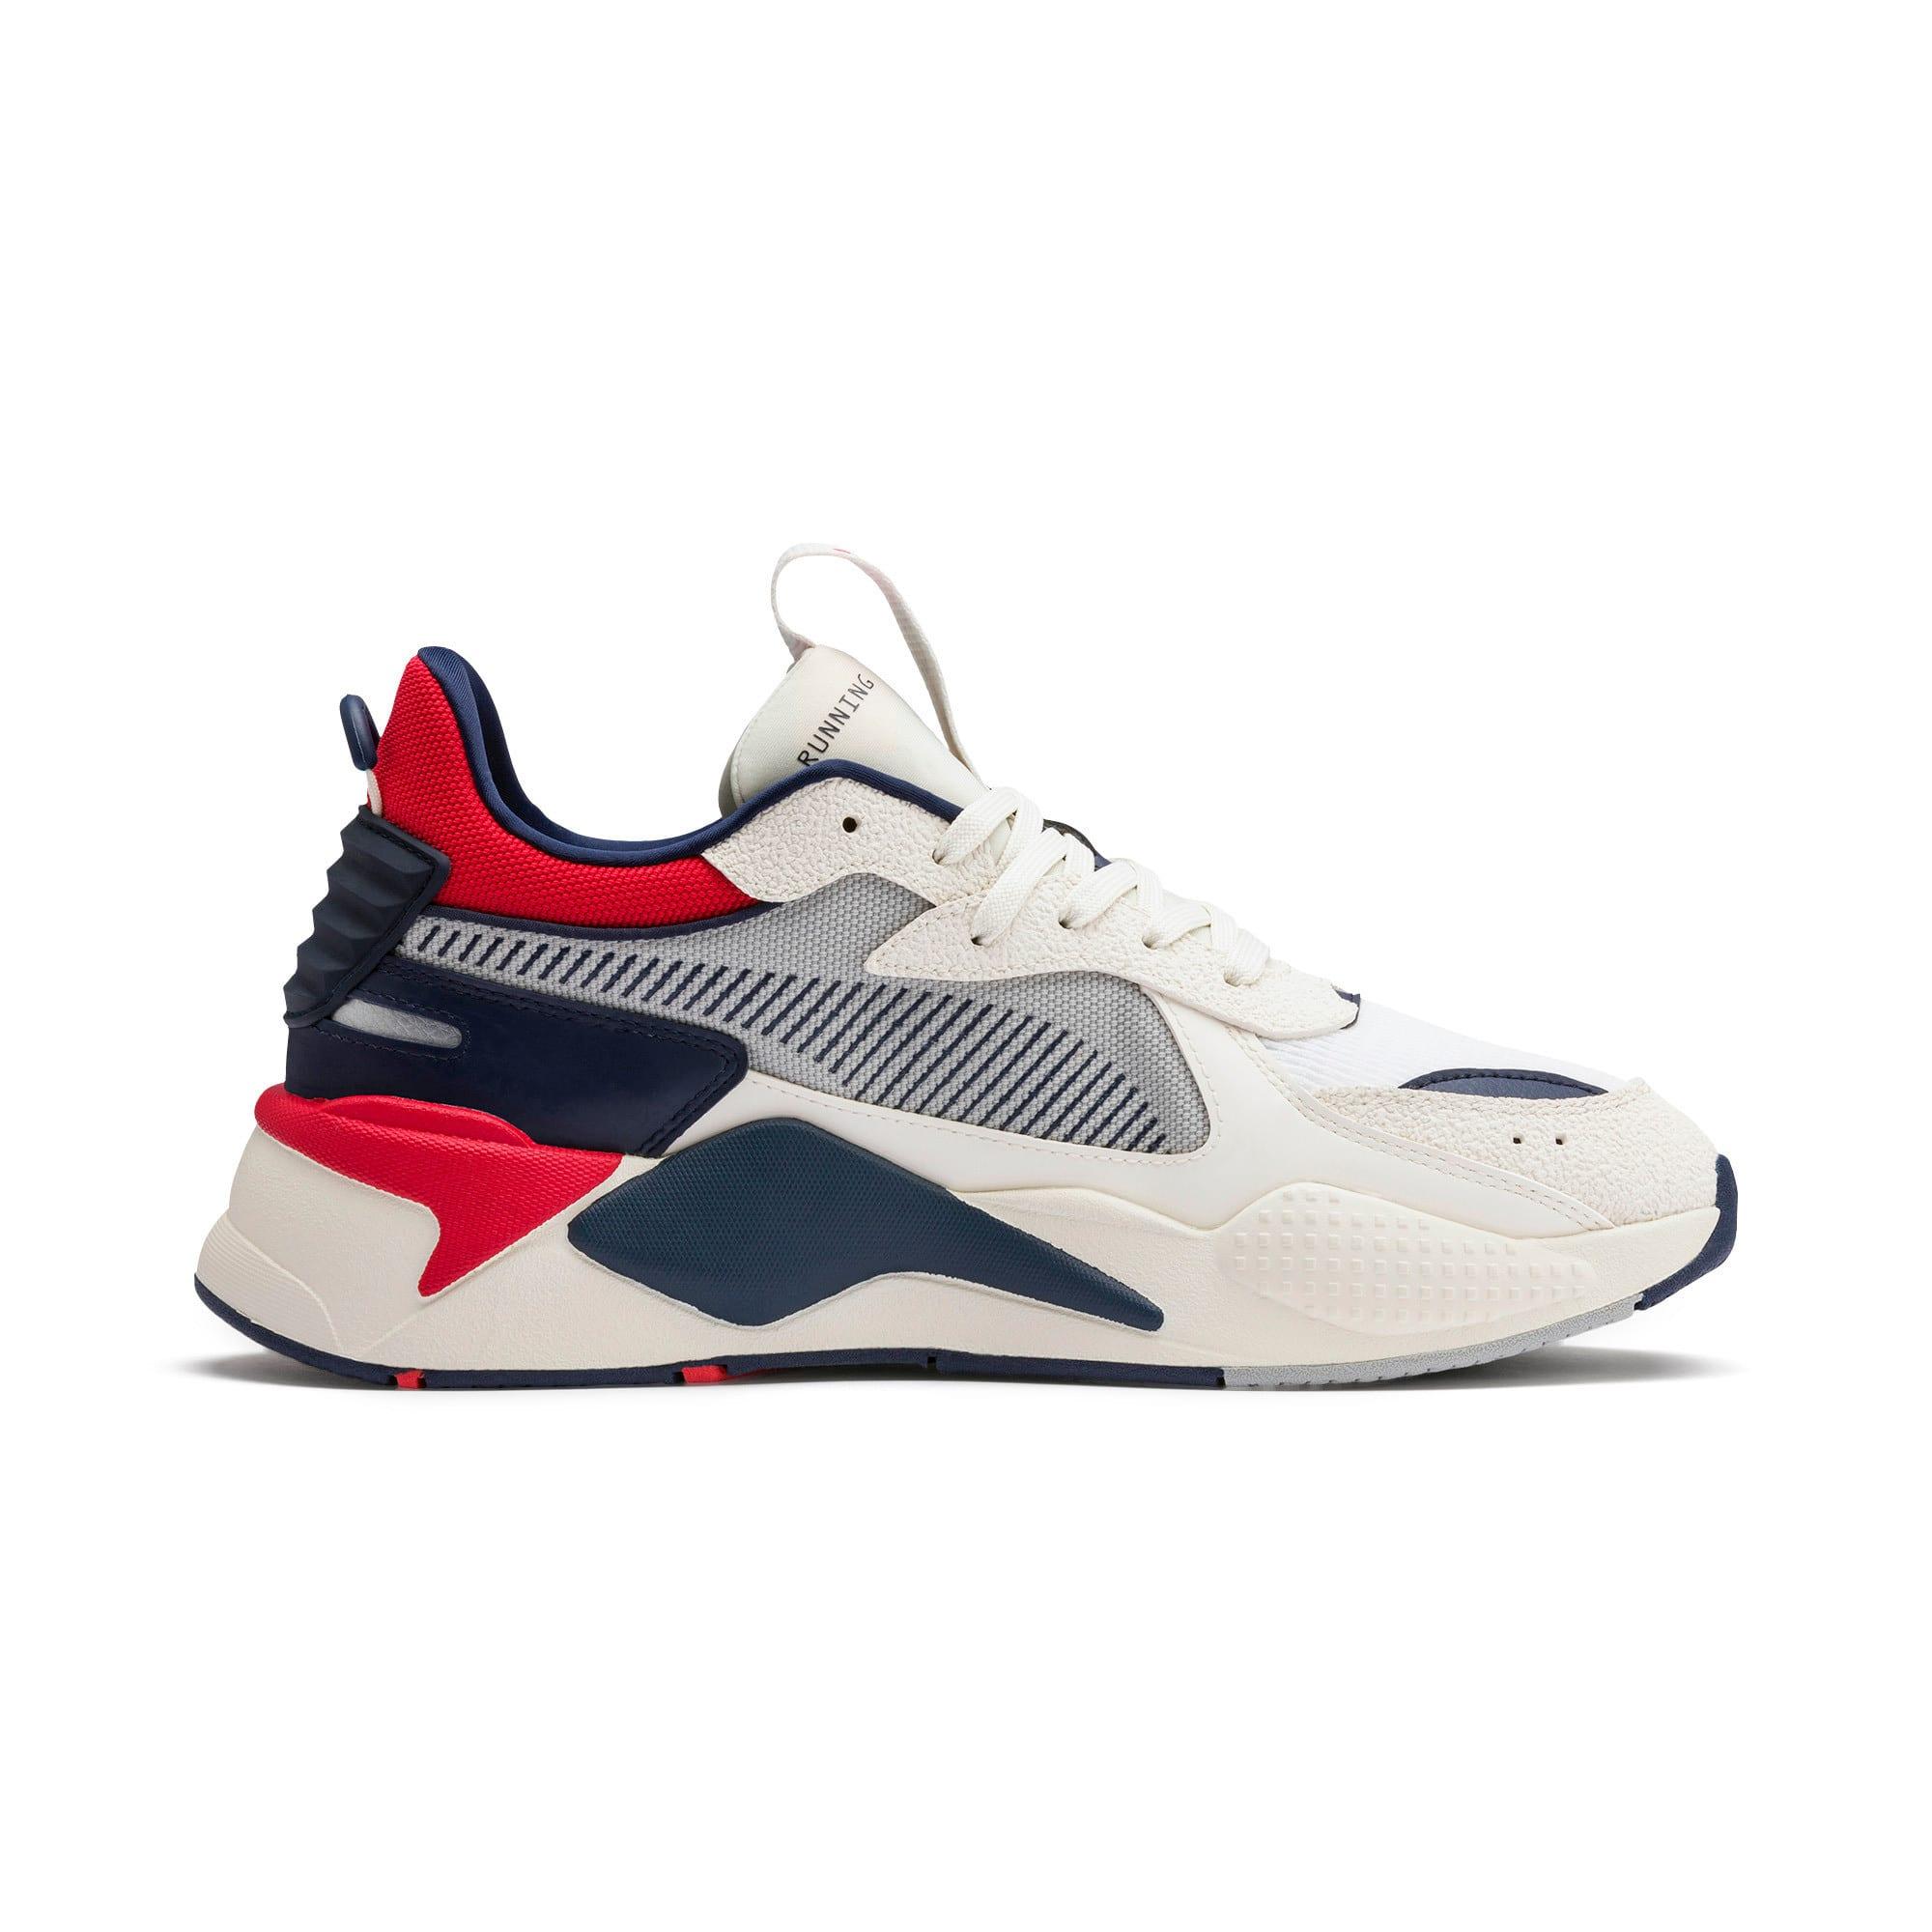 Thumbnail 6 of RS-X Hard Drive Sneaker, Whisper White-Peacoat, medium